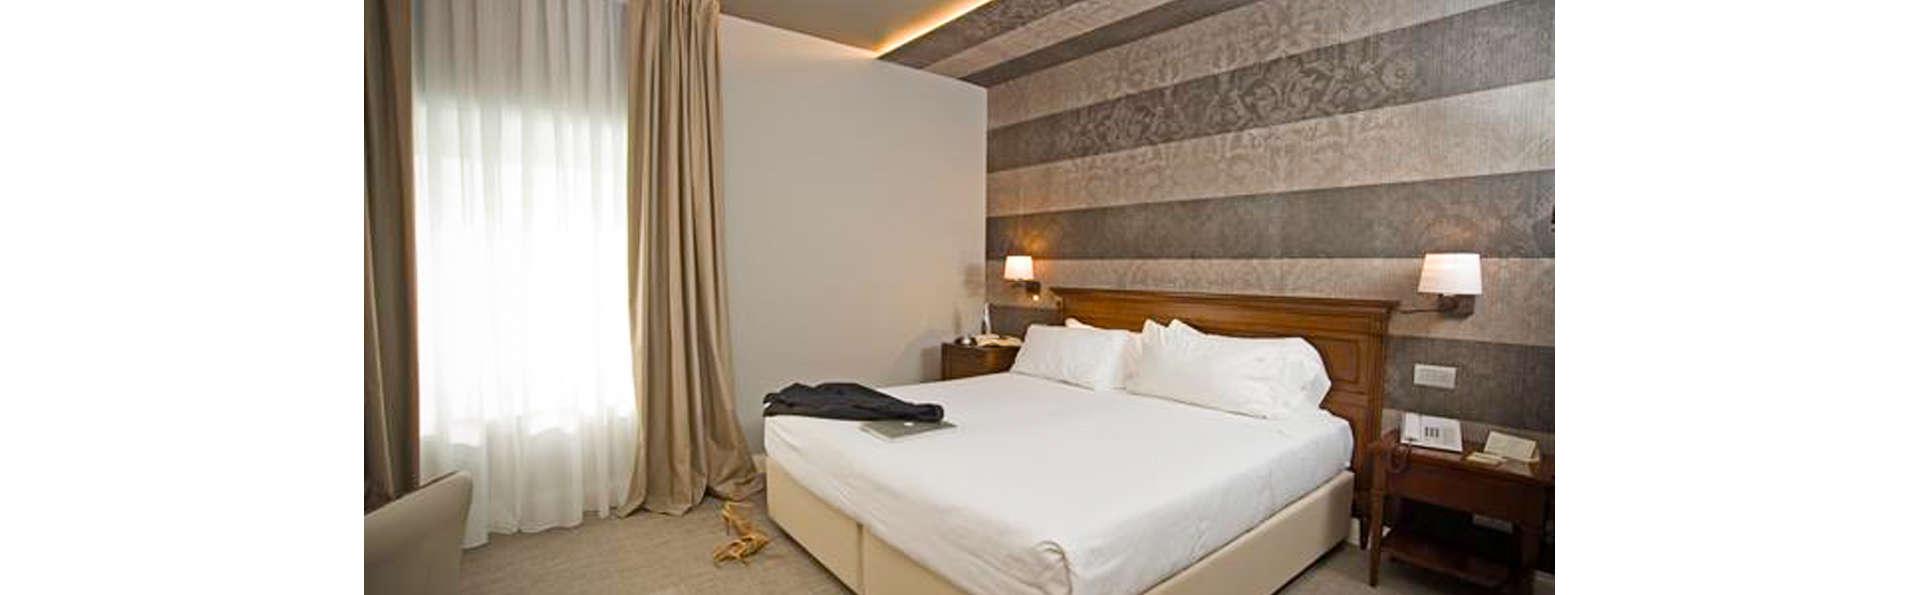 Grand Hotel Des Arts - EDIT_ROOM_01.jpg